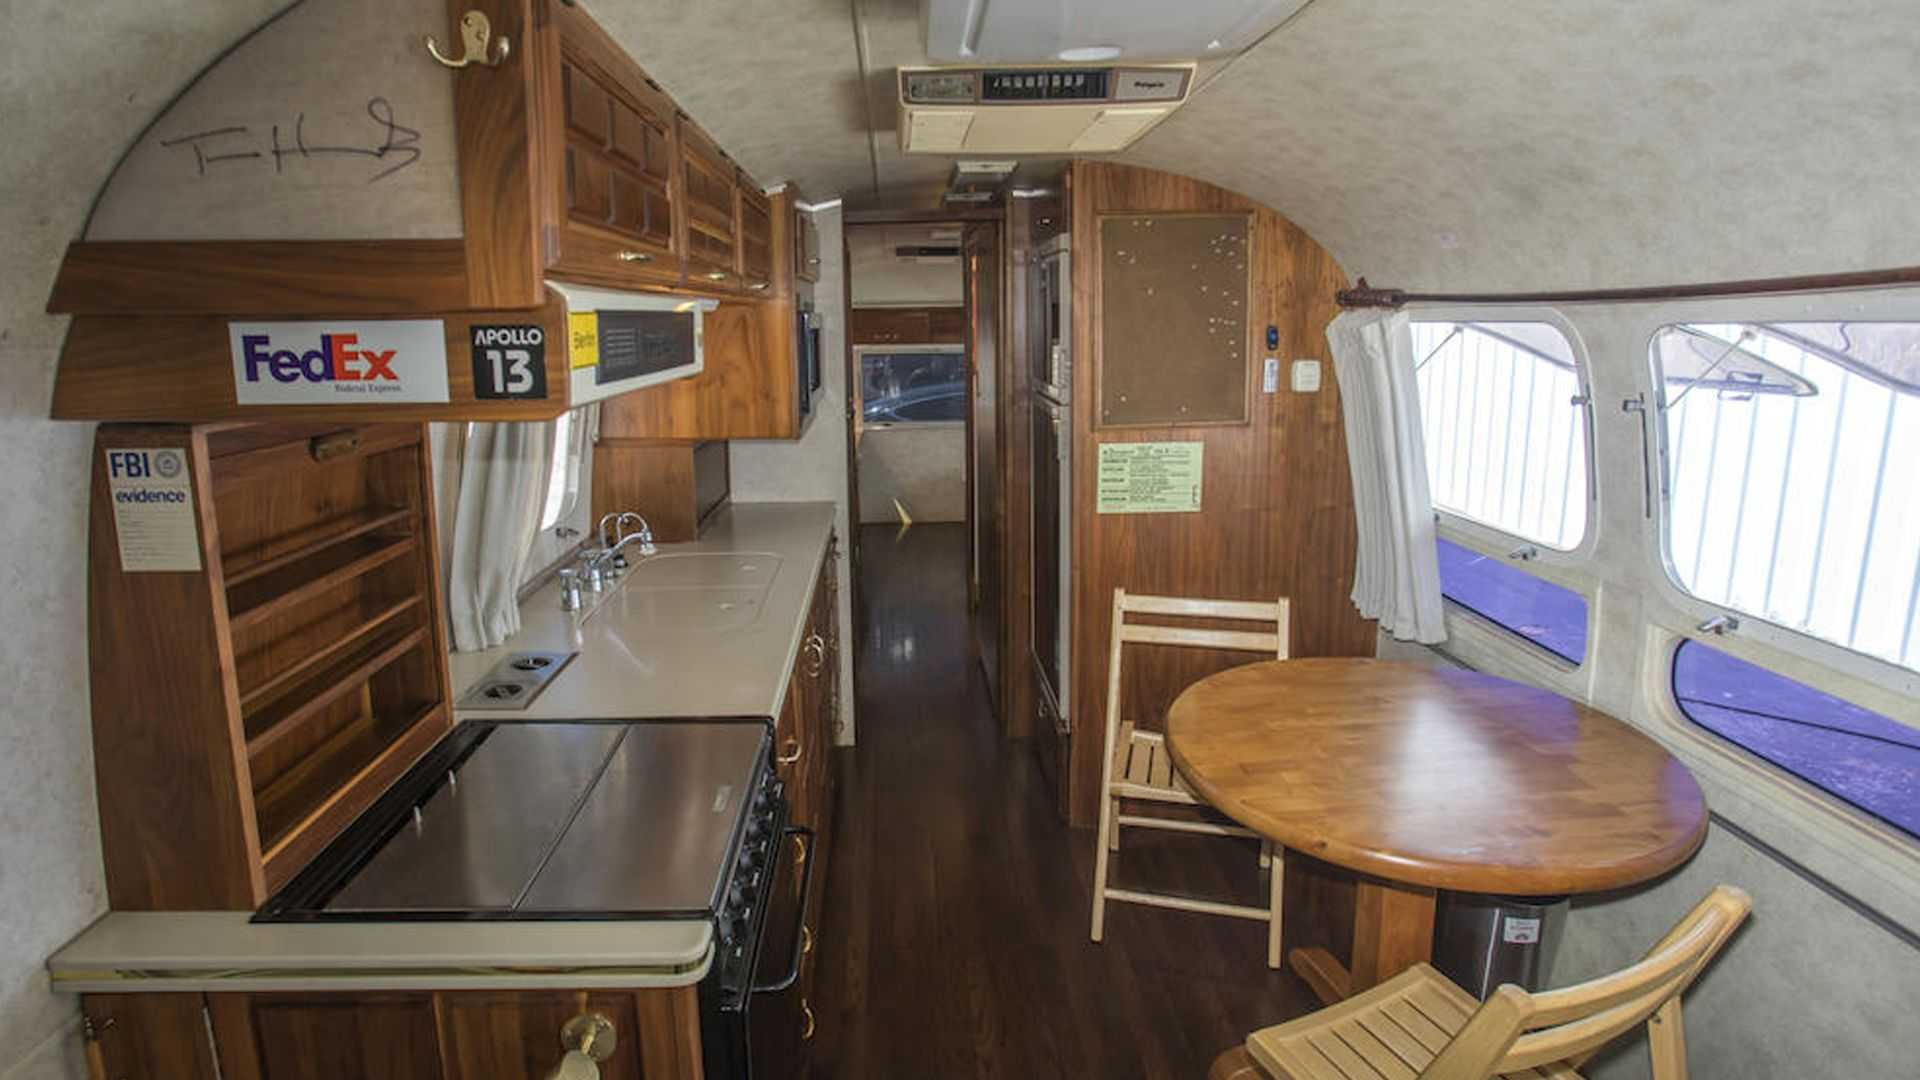 Tom-Hanks-Airstream-trailer-for-sale-11